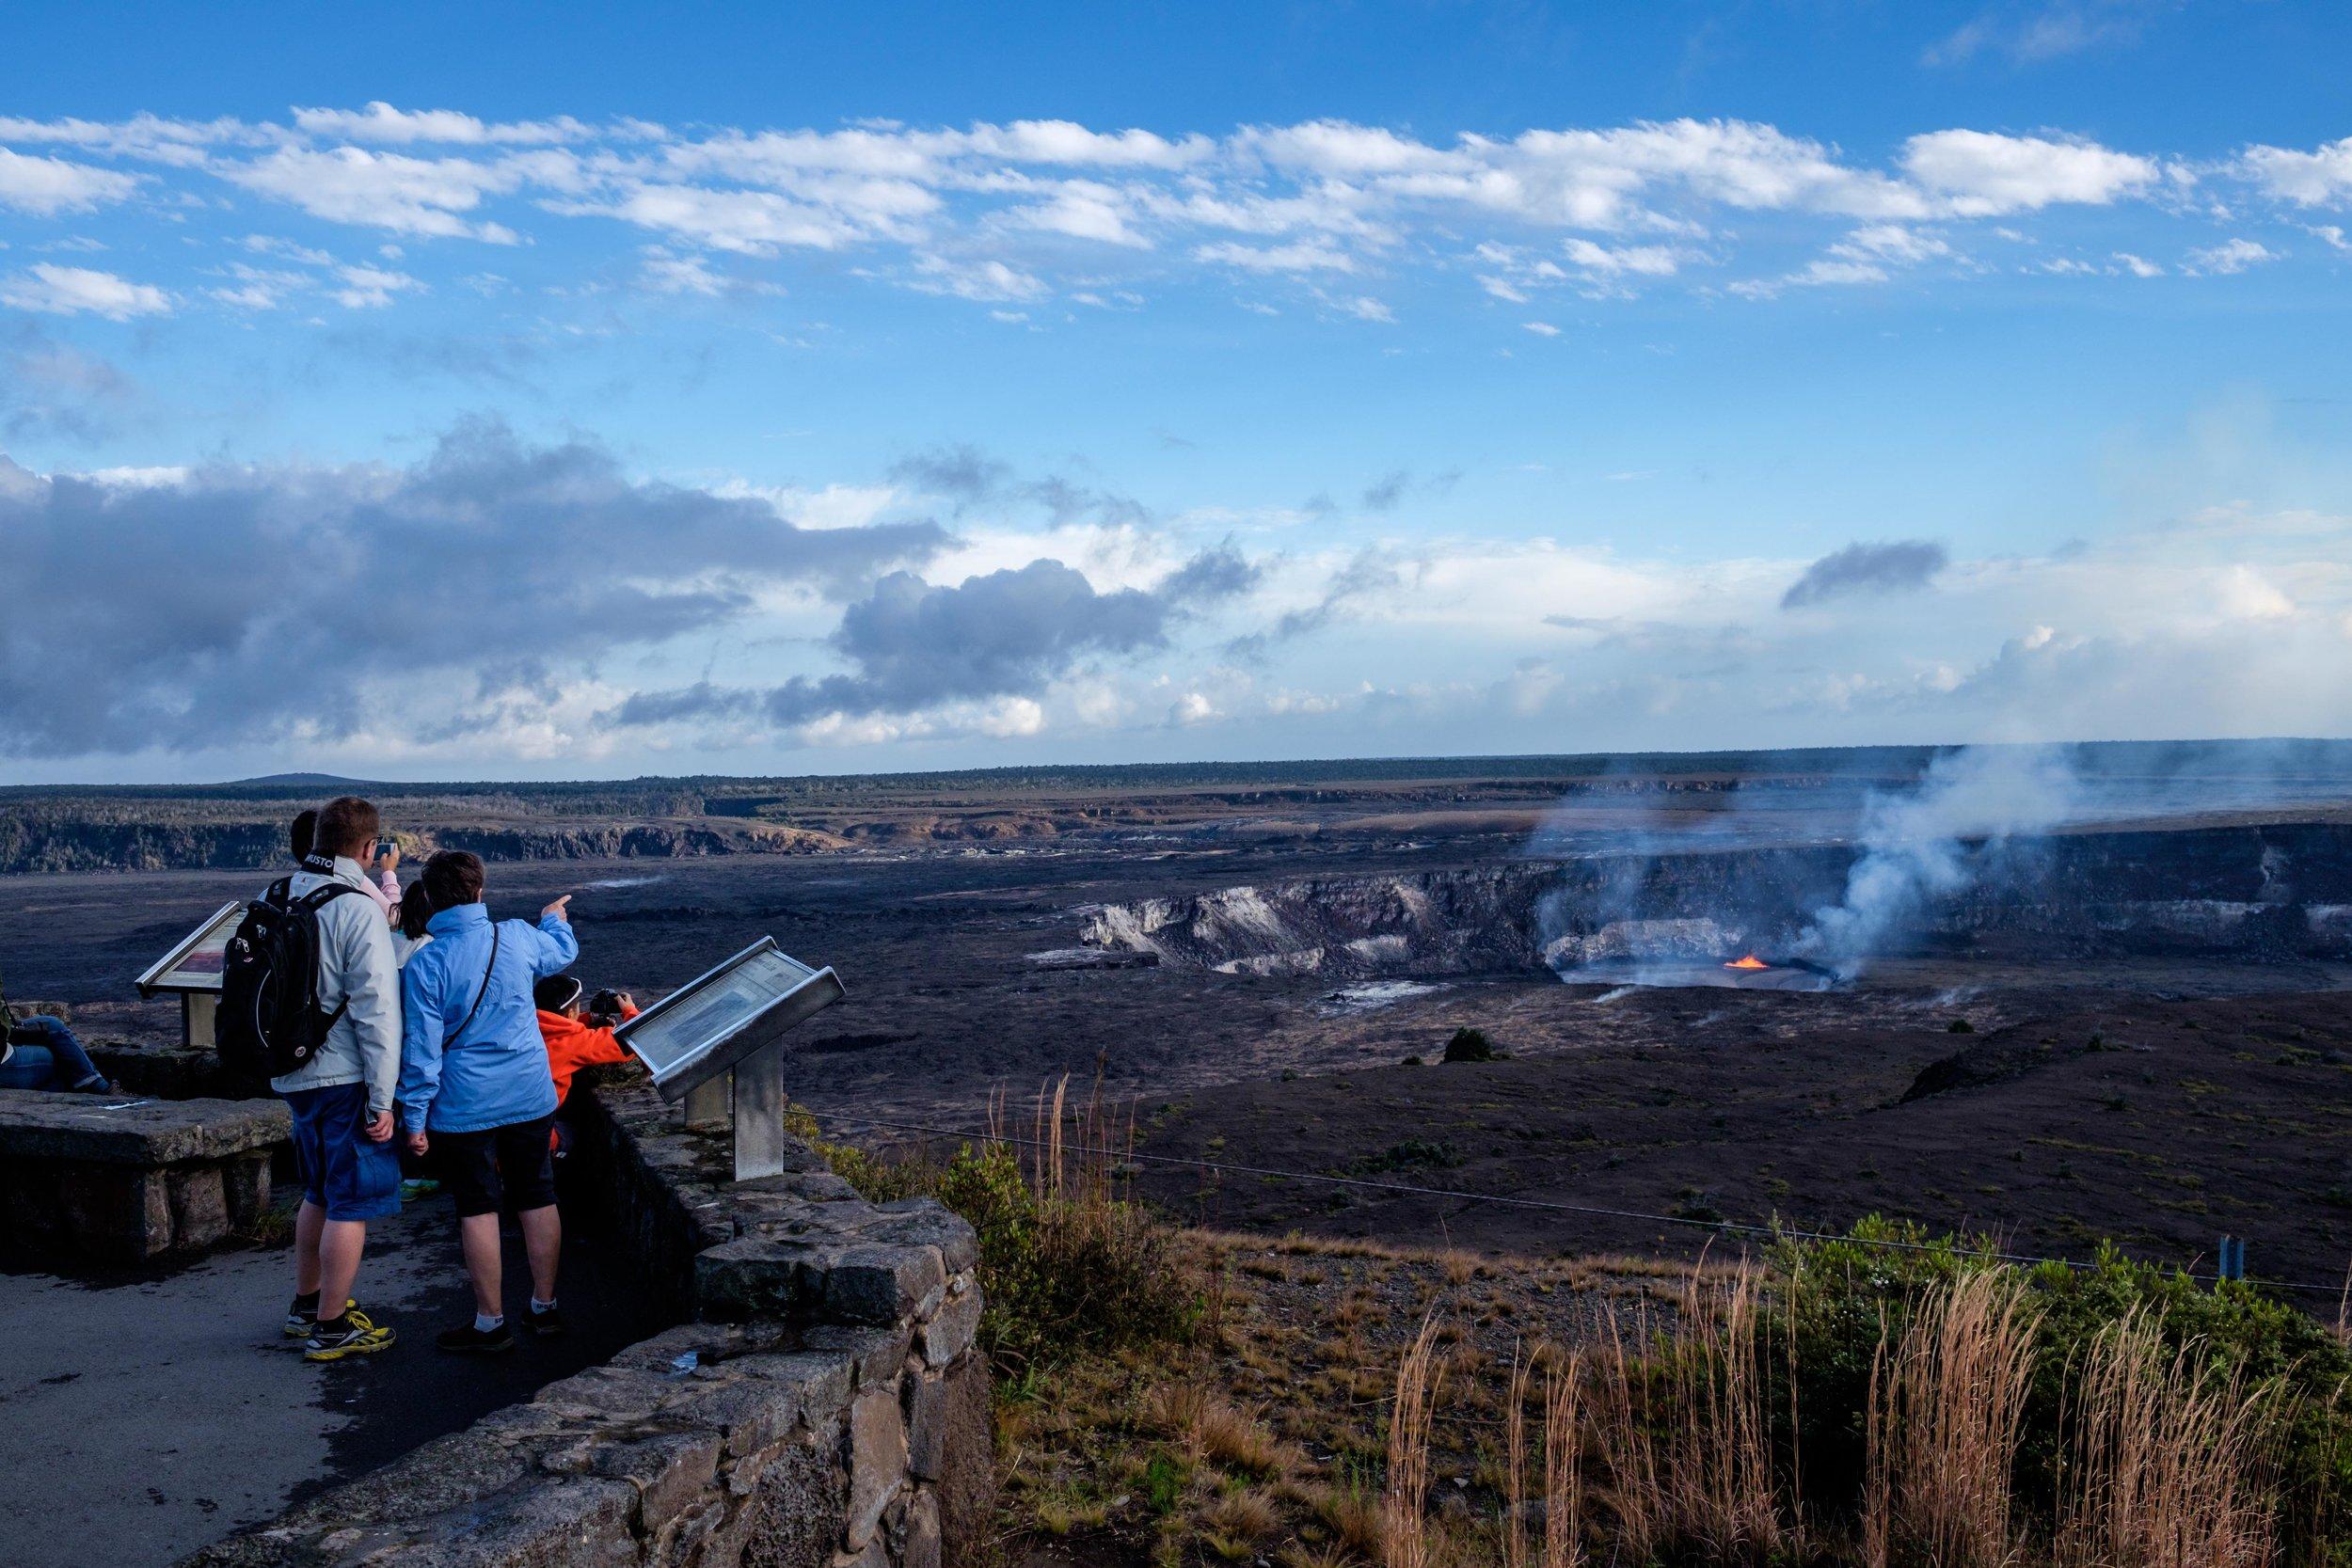 Hawai'i Volcanoes National Park visitors watch the wonder of the Halema'uma'u Crater erupting 100 feet away.